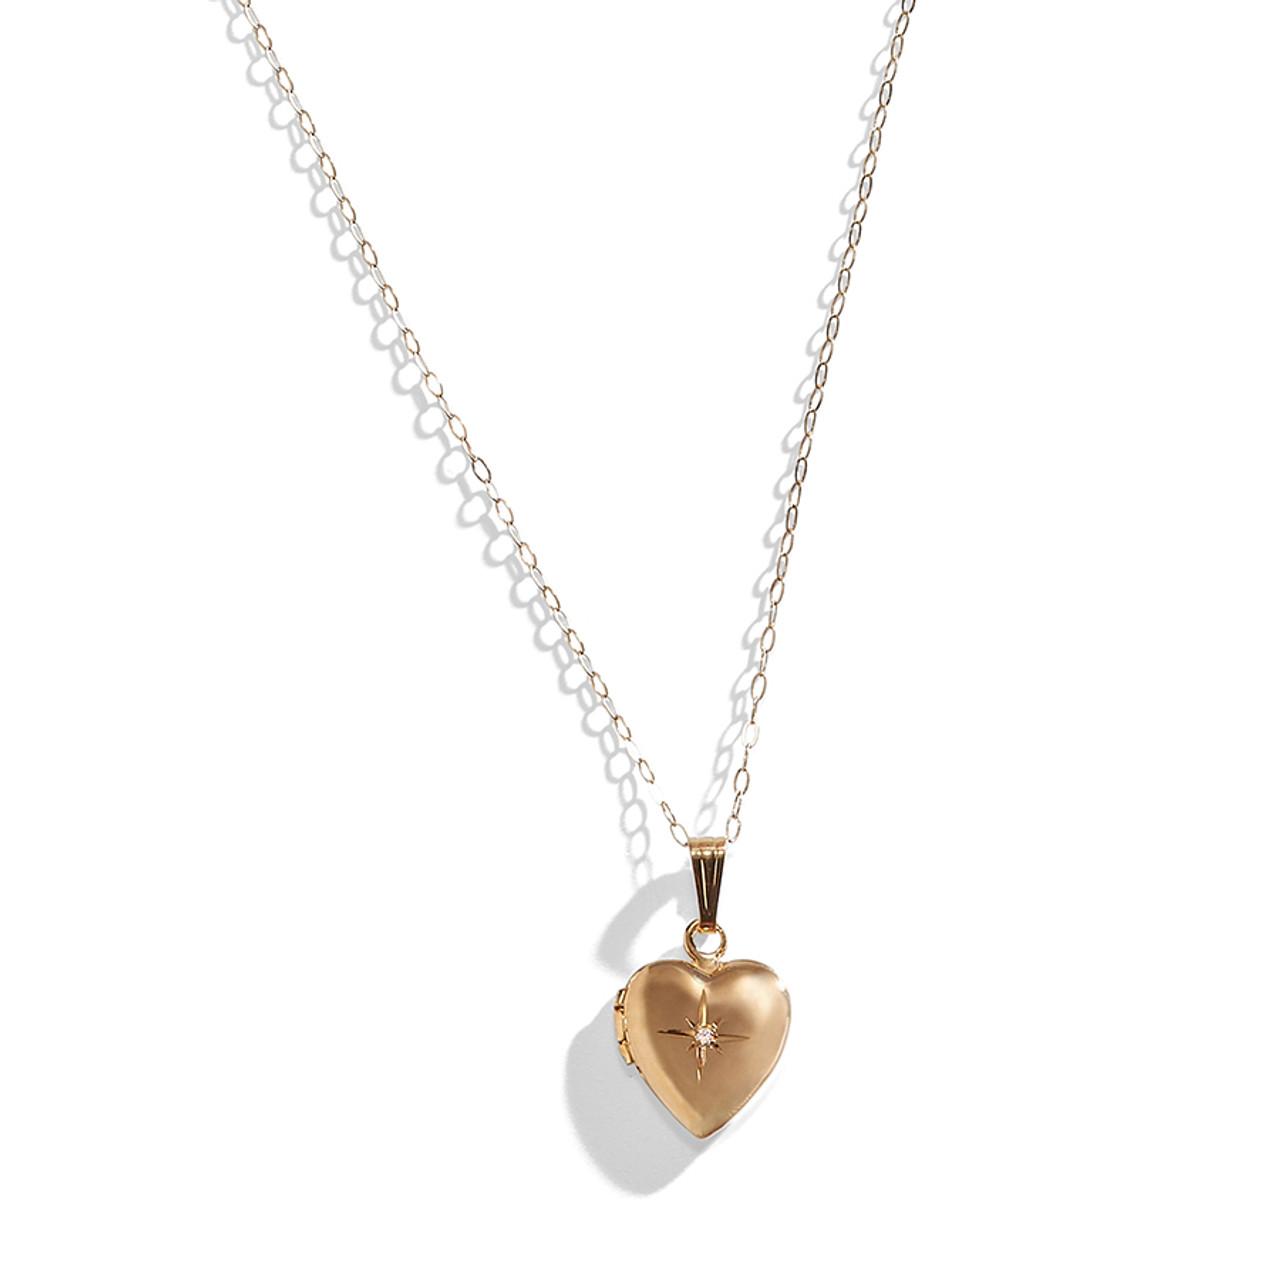 52fc34b4d 14K Gold Secret Heart Locket with Diamond Accent.